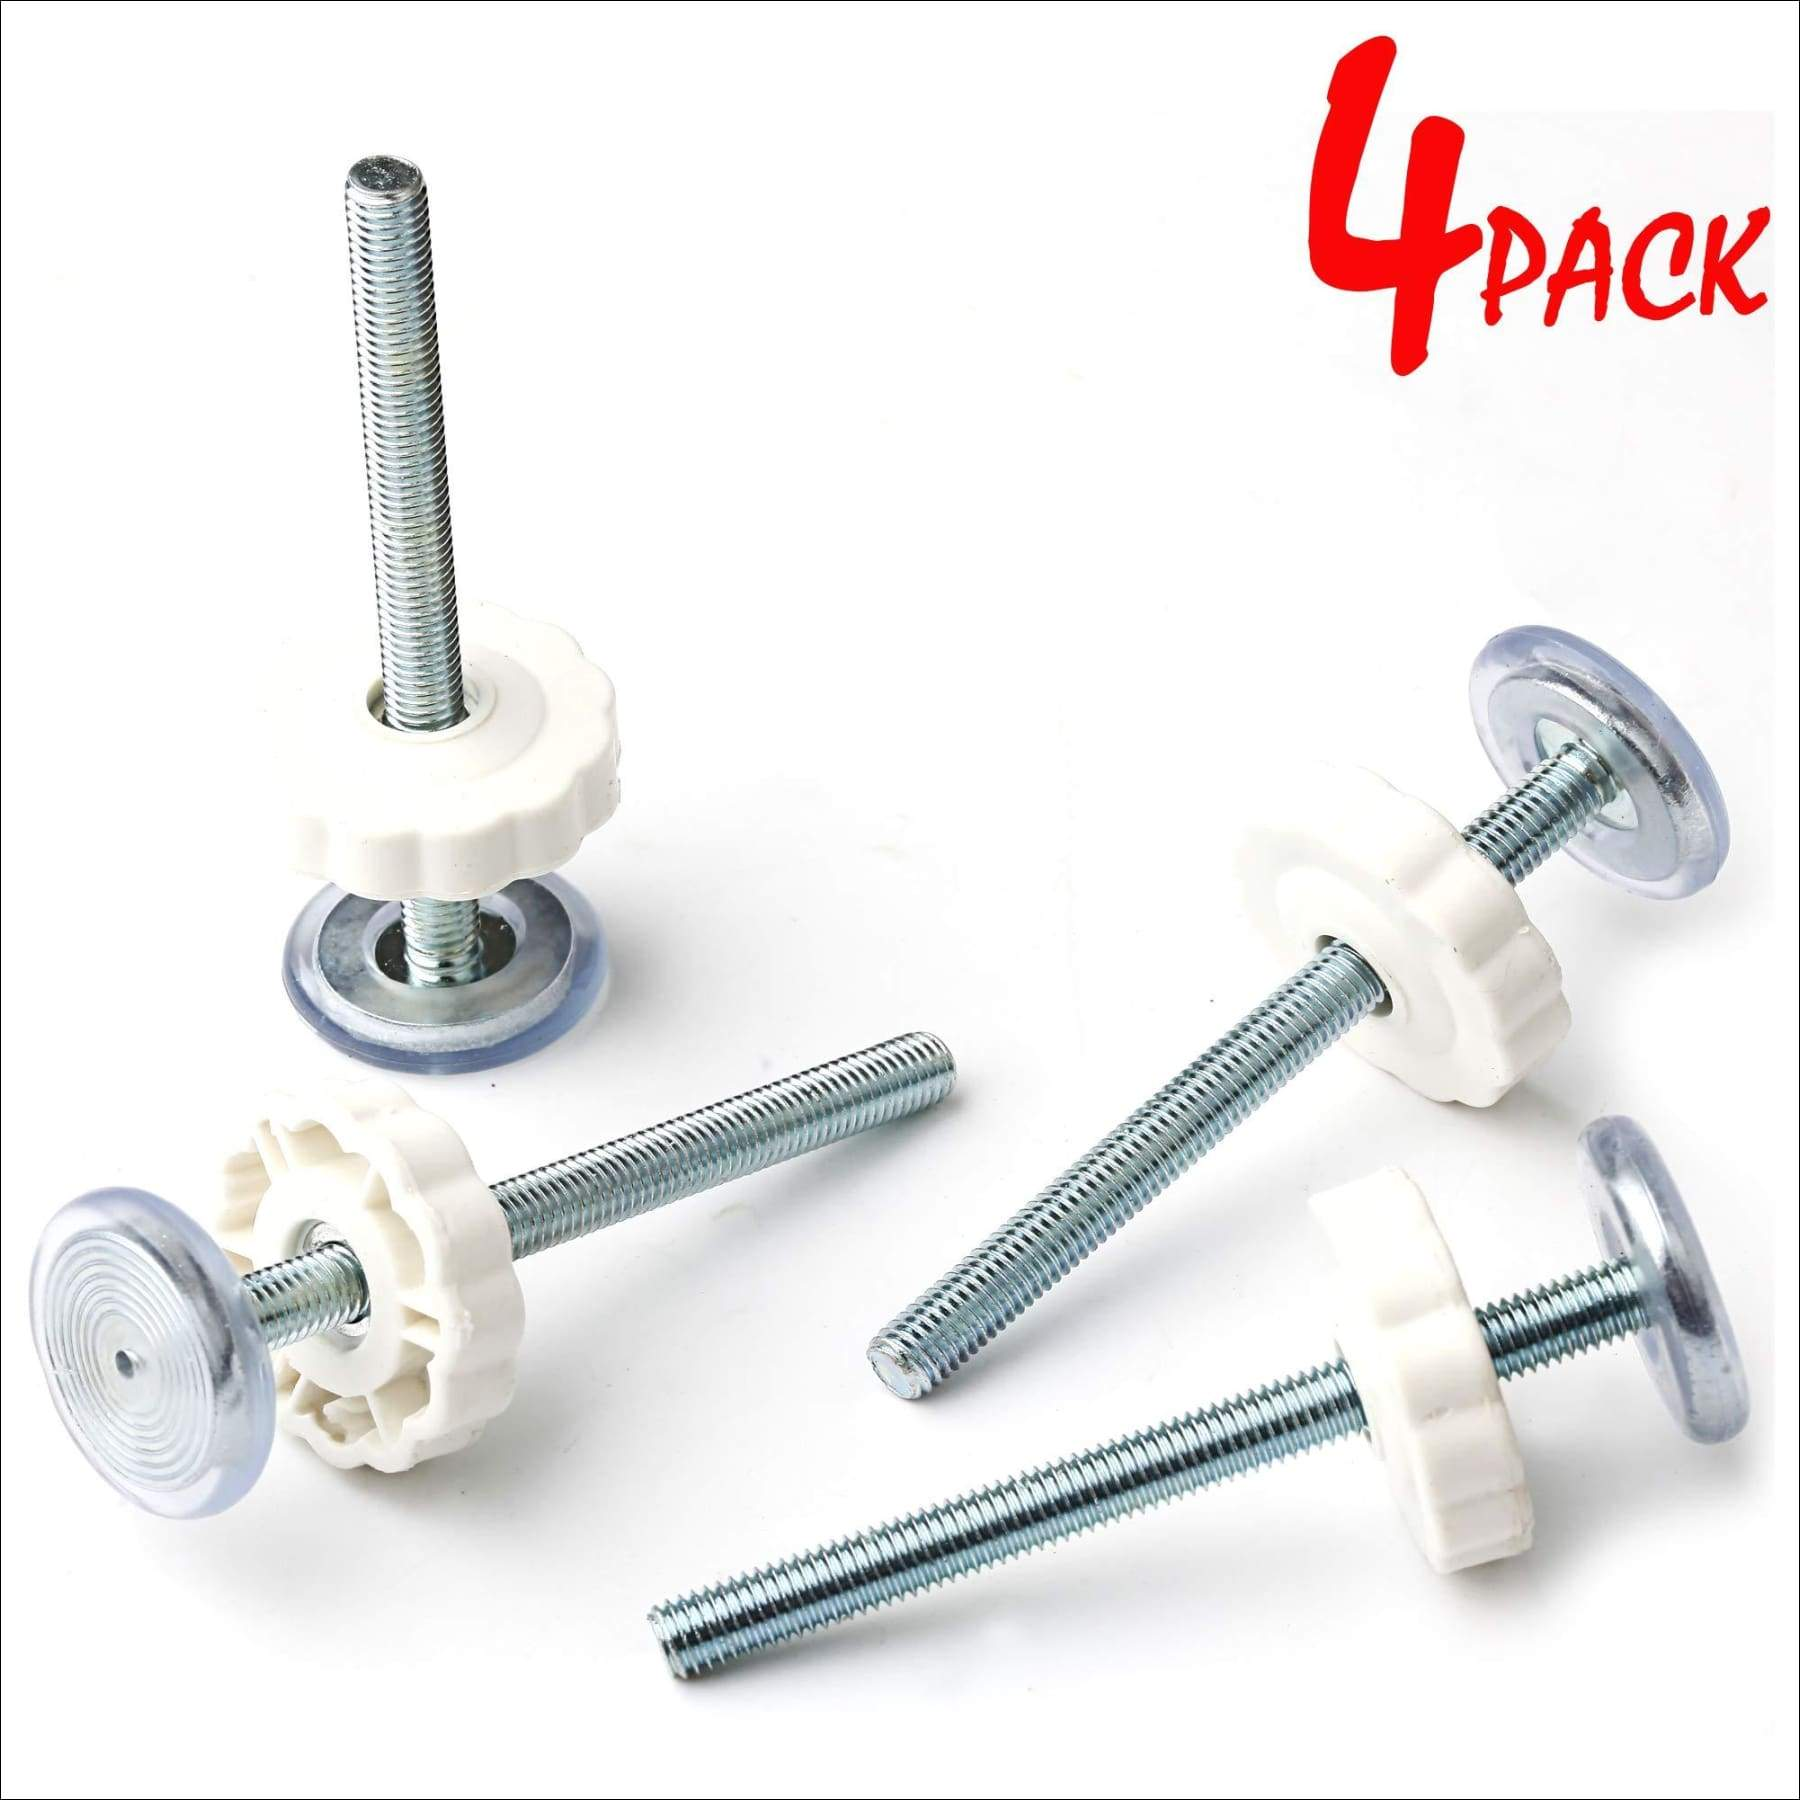 4 Pack M8 Pressure Mounted Baby Gates Threaded Spindle Rods,8 MM Walk Thru Gates